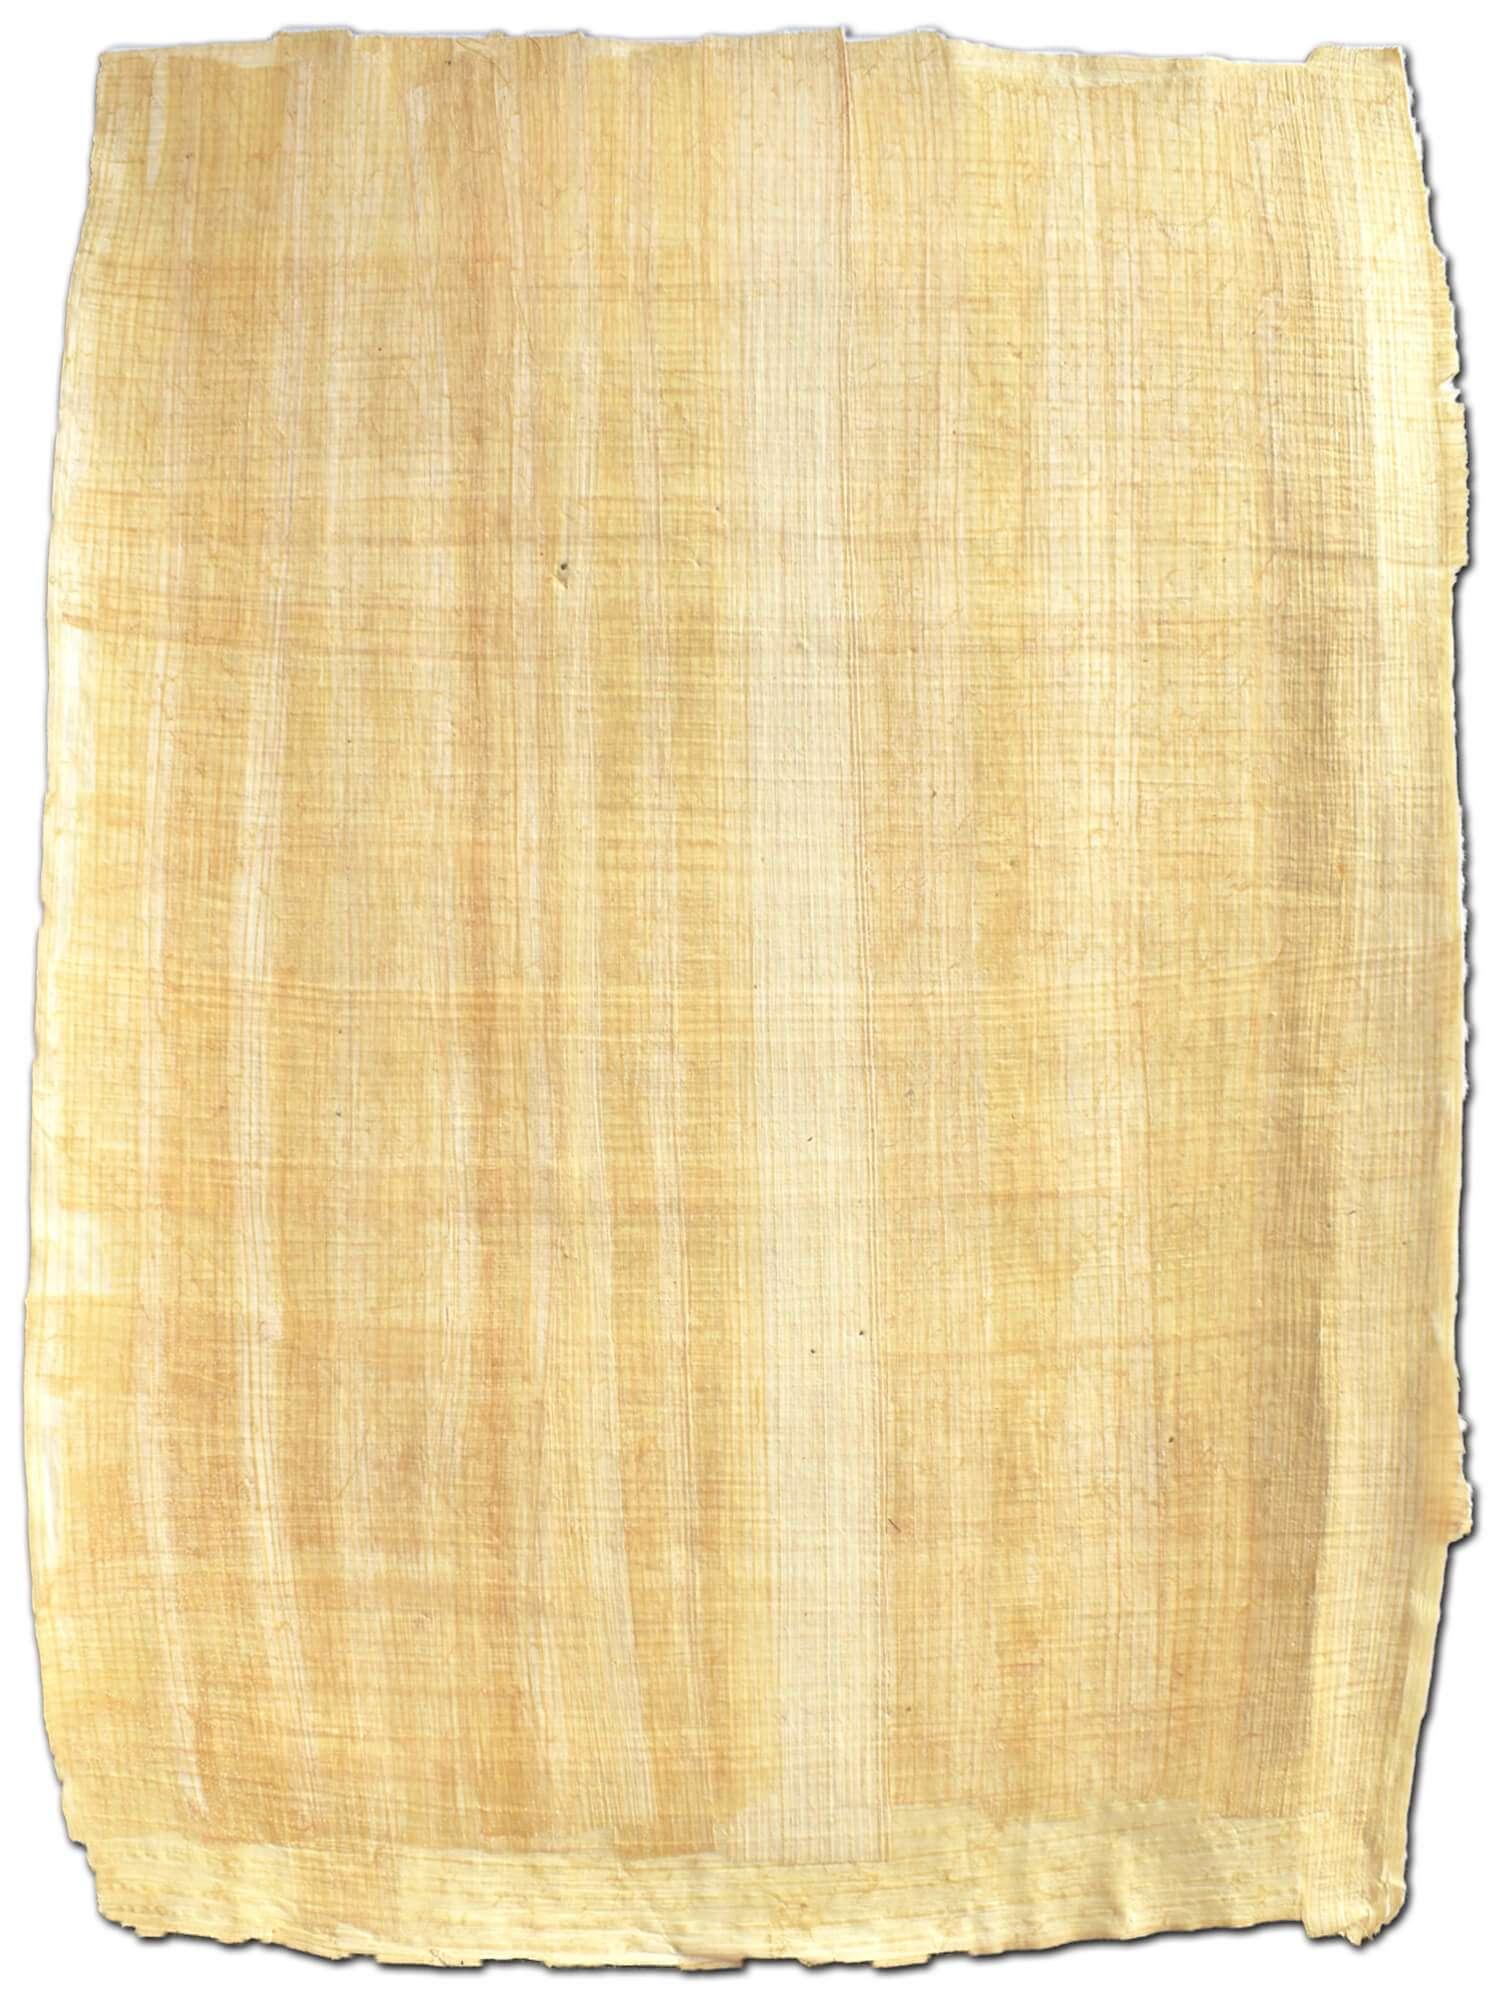 papyrus-papyrusblatt-naturrand